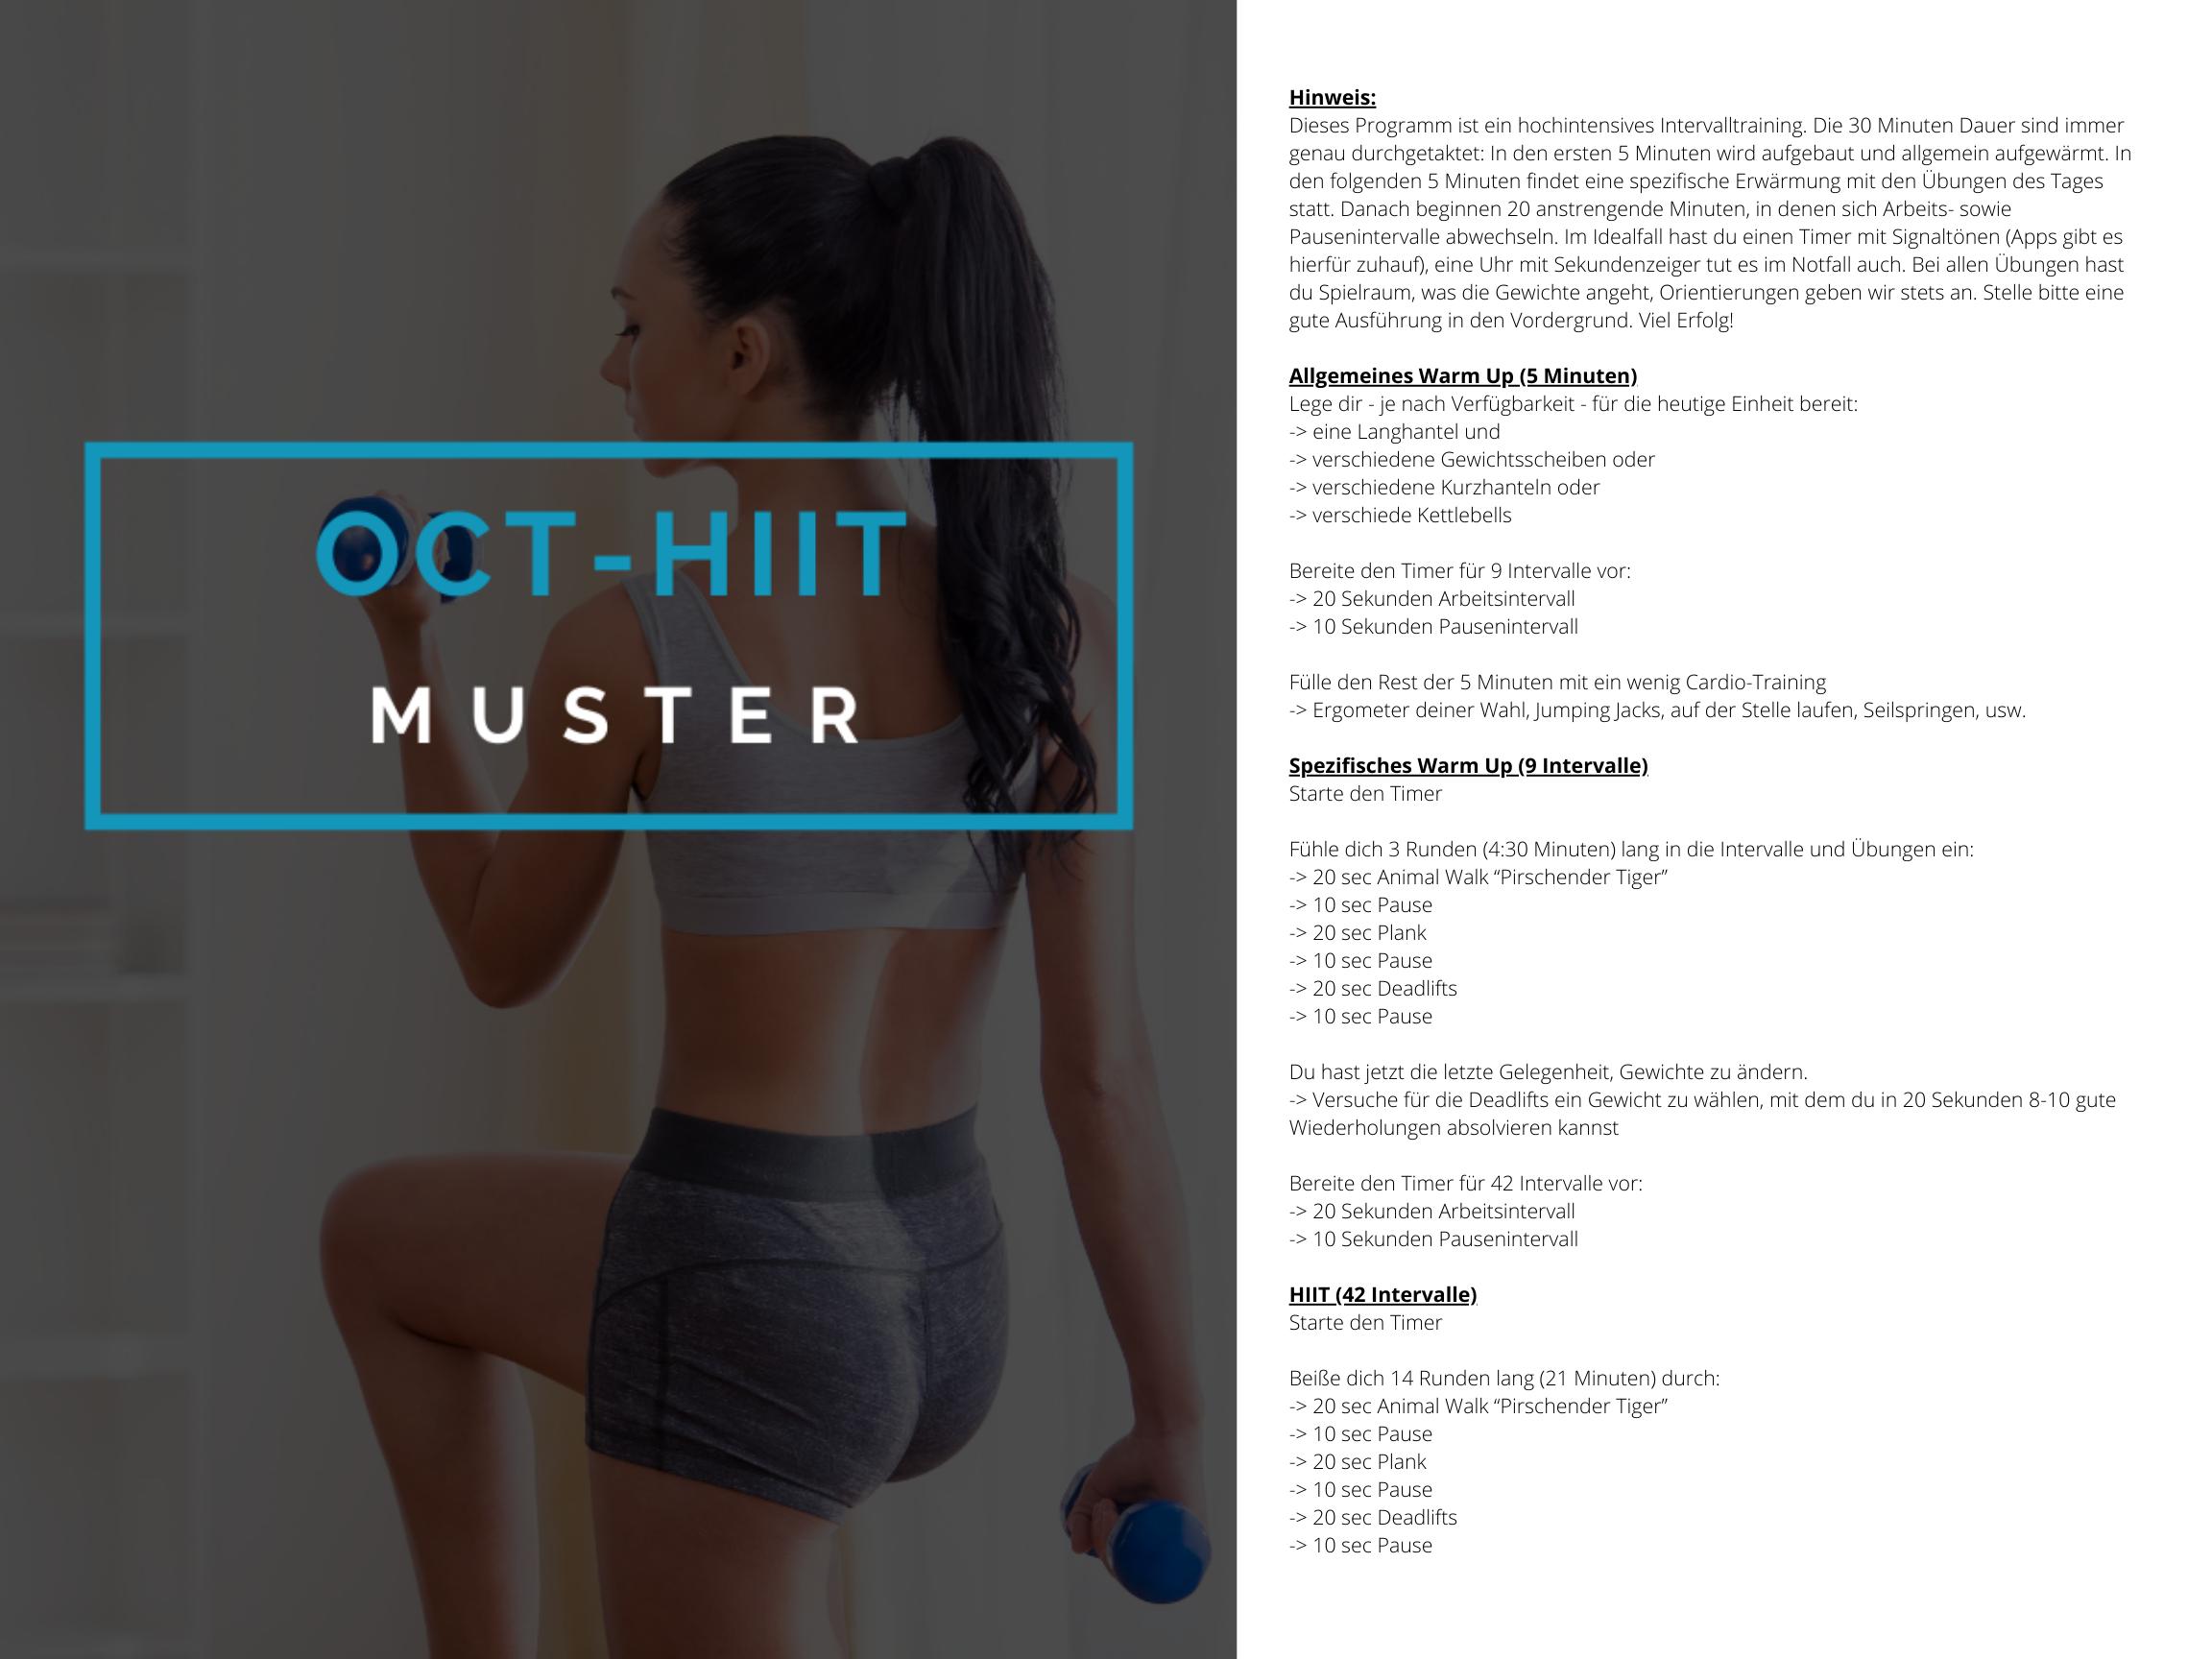 OCT-HIIT Muster Trainingsplan 2